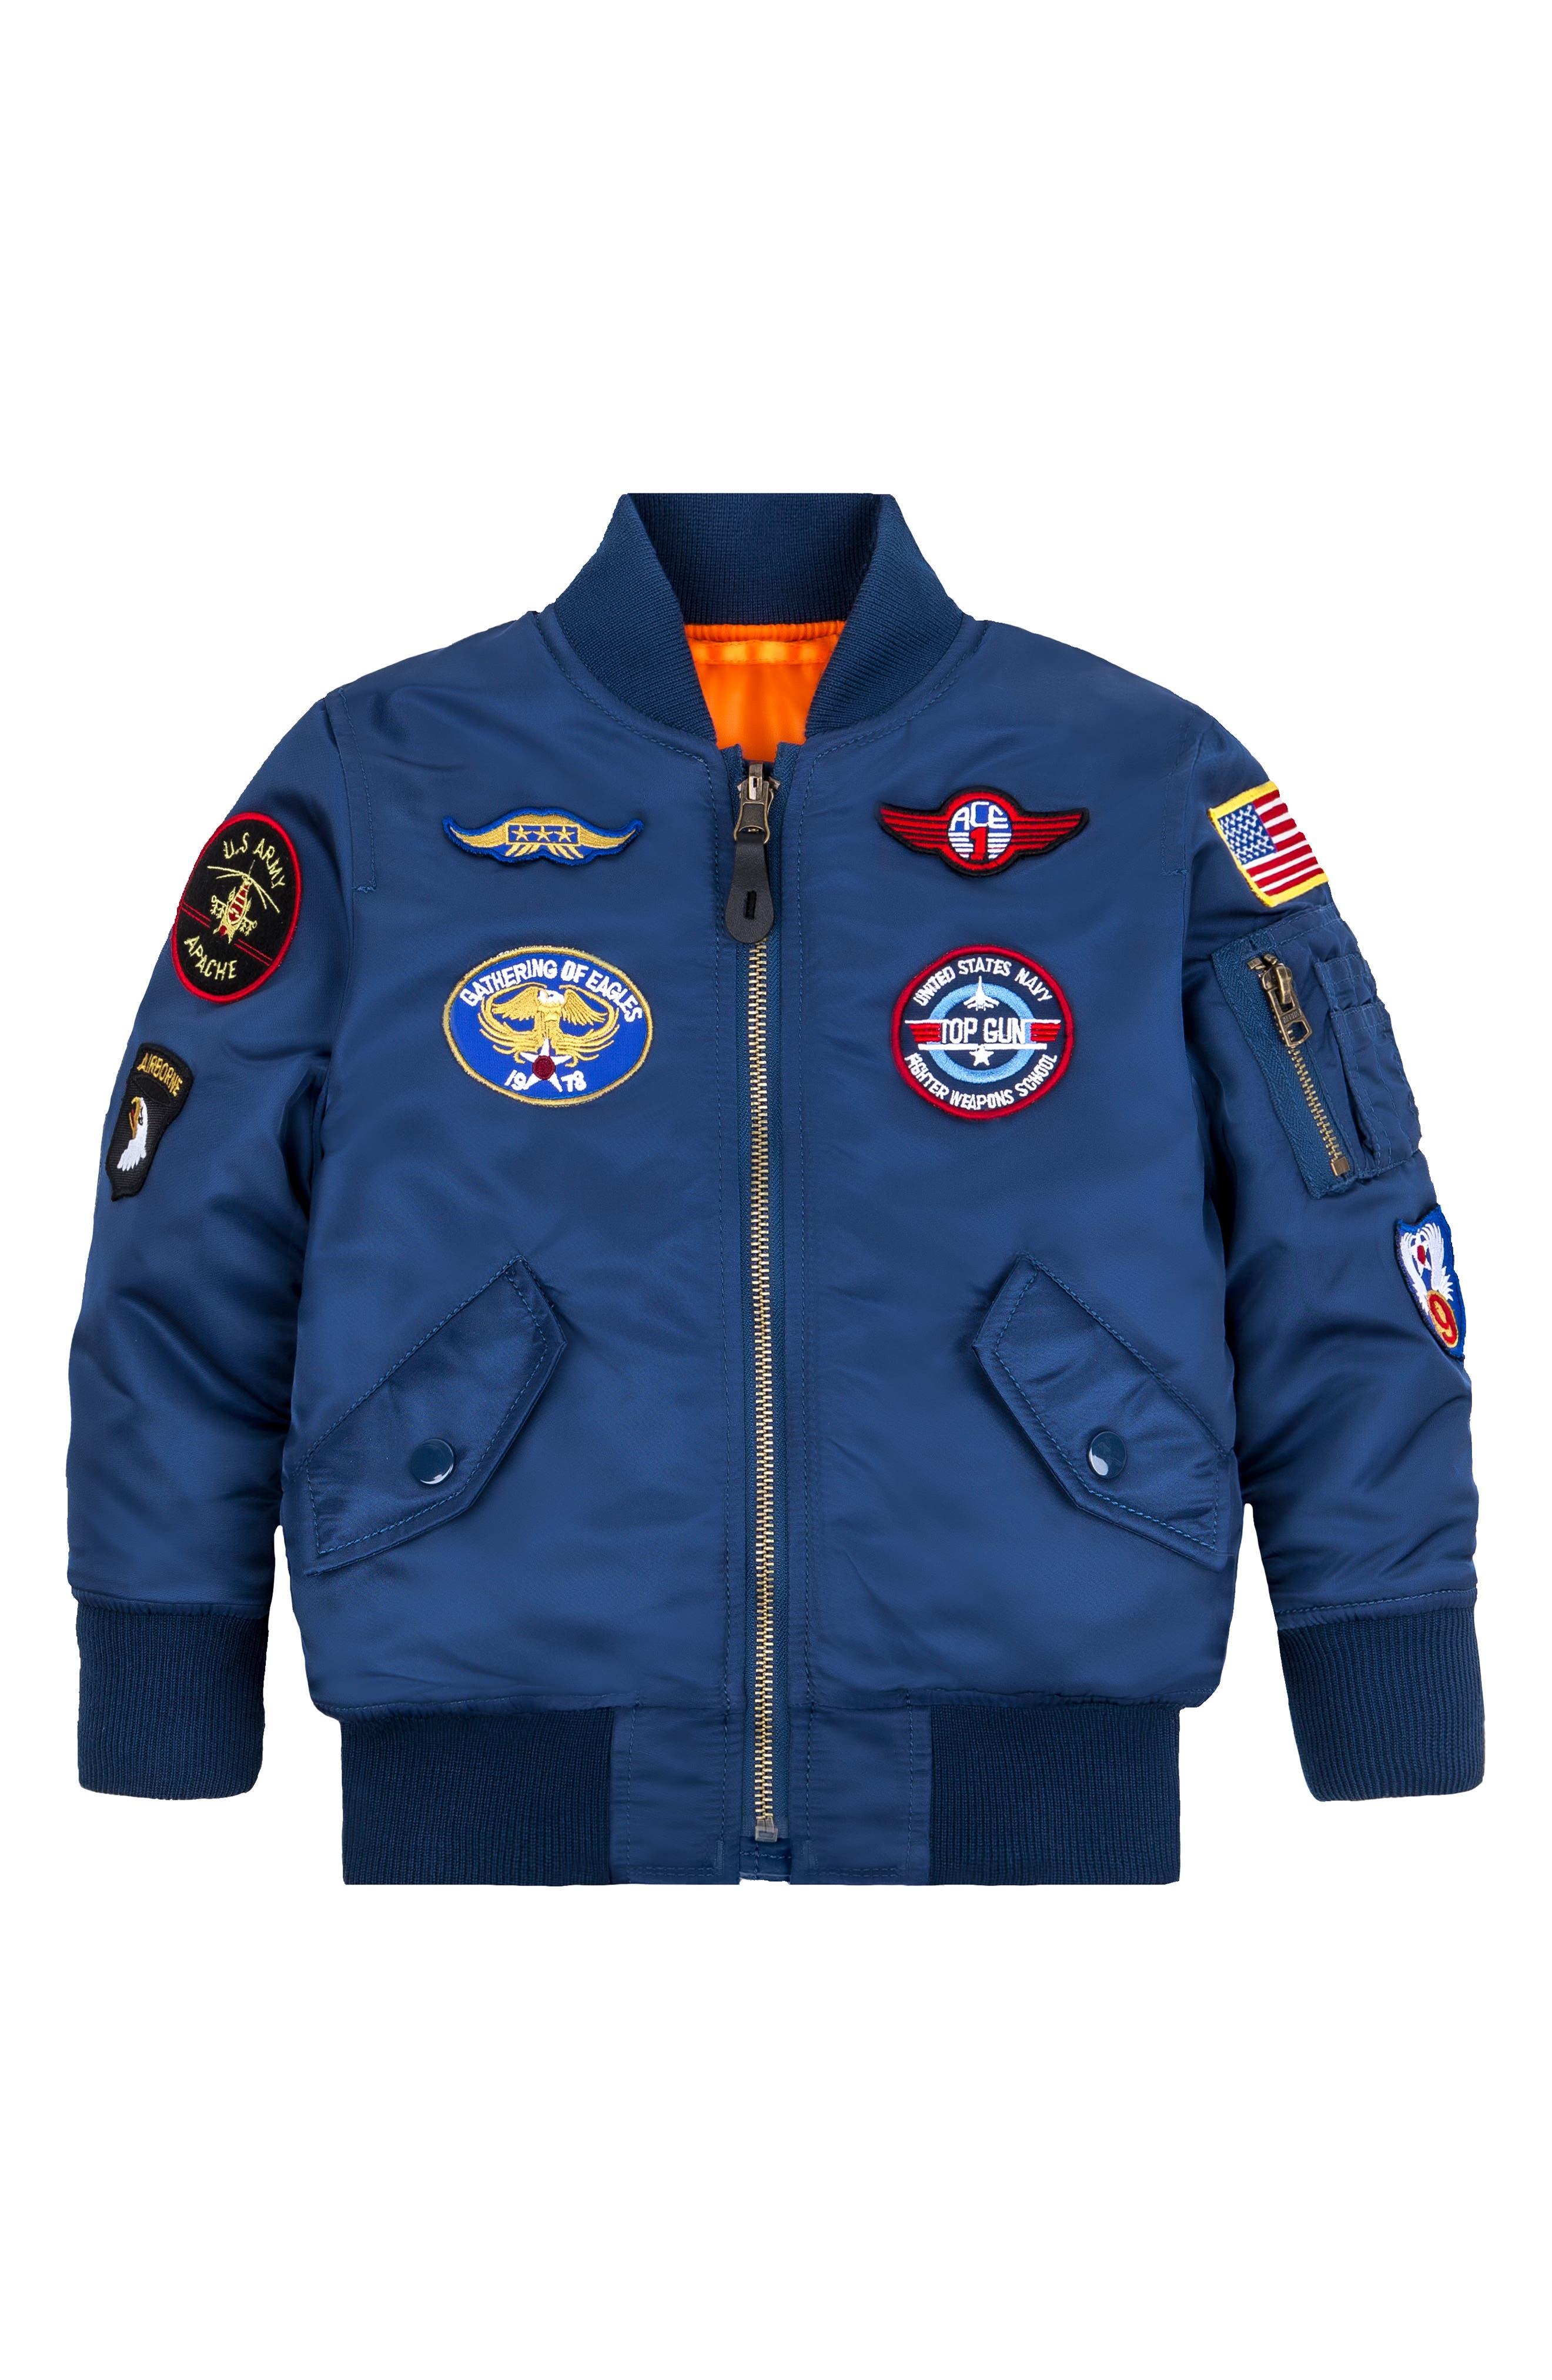 ALPHA INDUSTRIES MA-1 Patch Flight Jacket, Main, color, BLUE NO 9